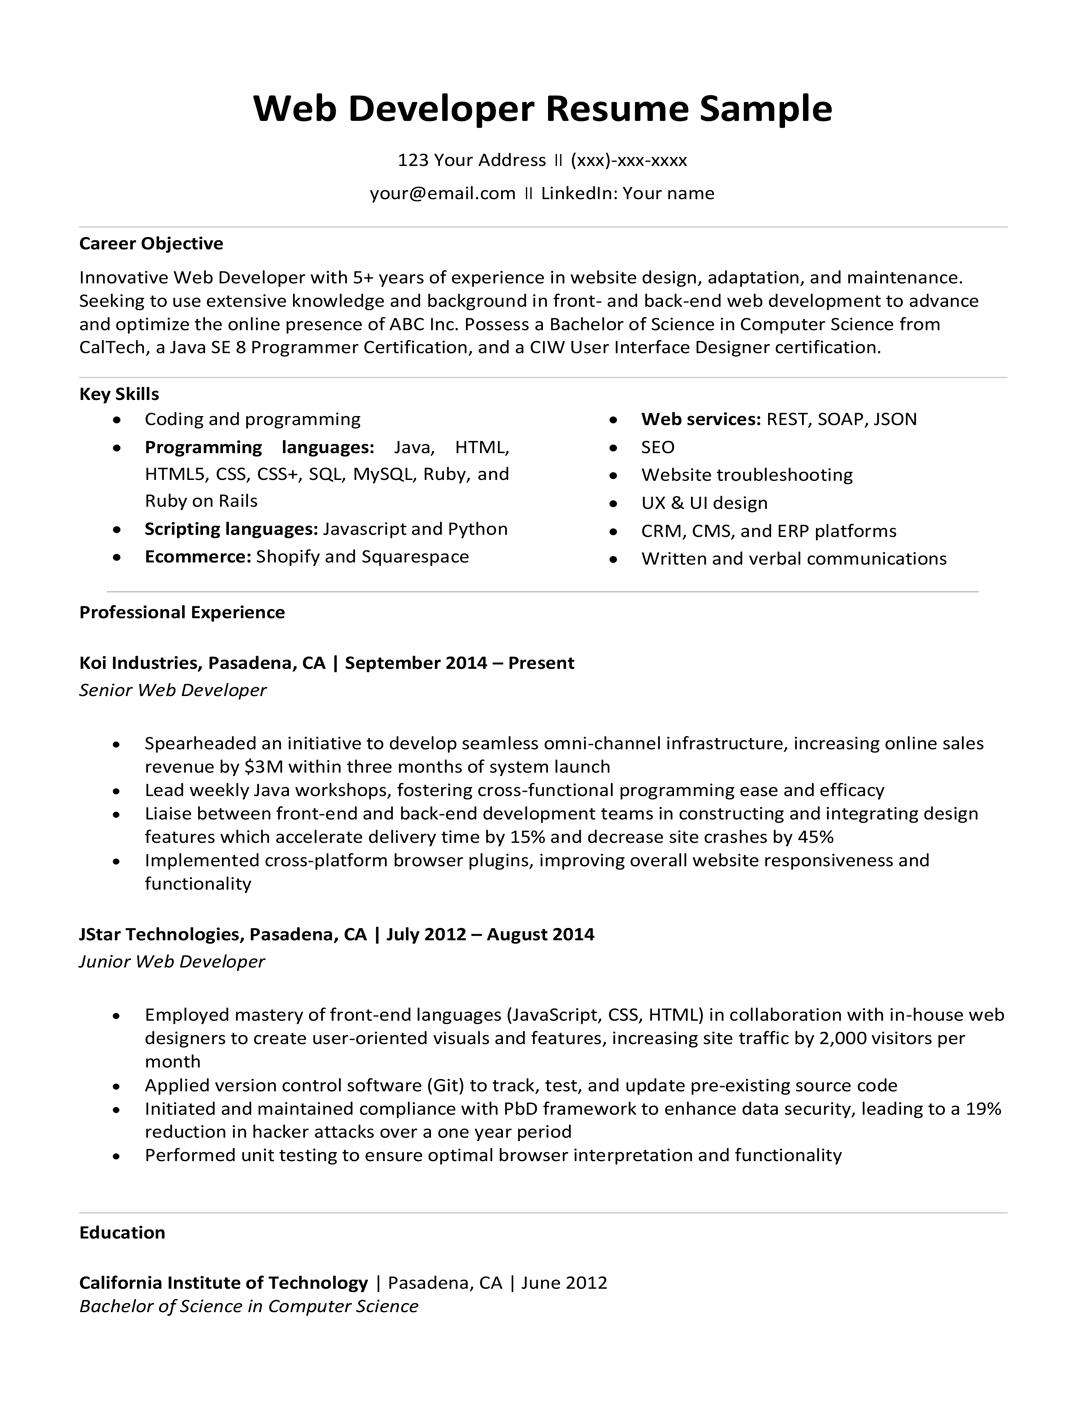 Web Developer Resume Sample Writing Tips Resume Companion